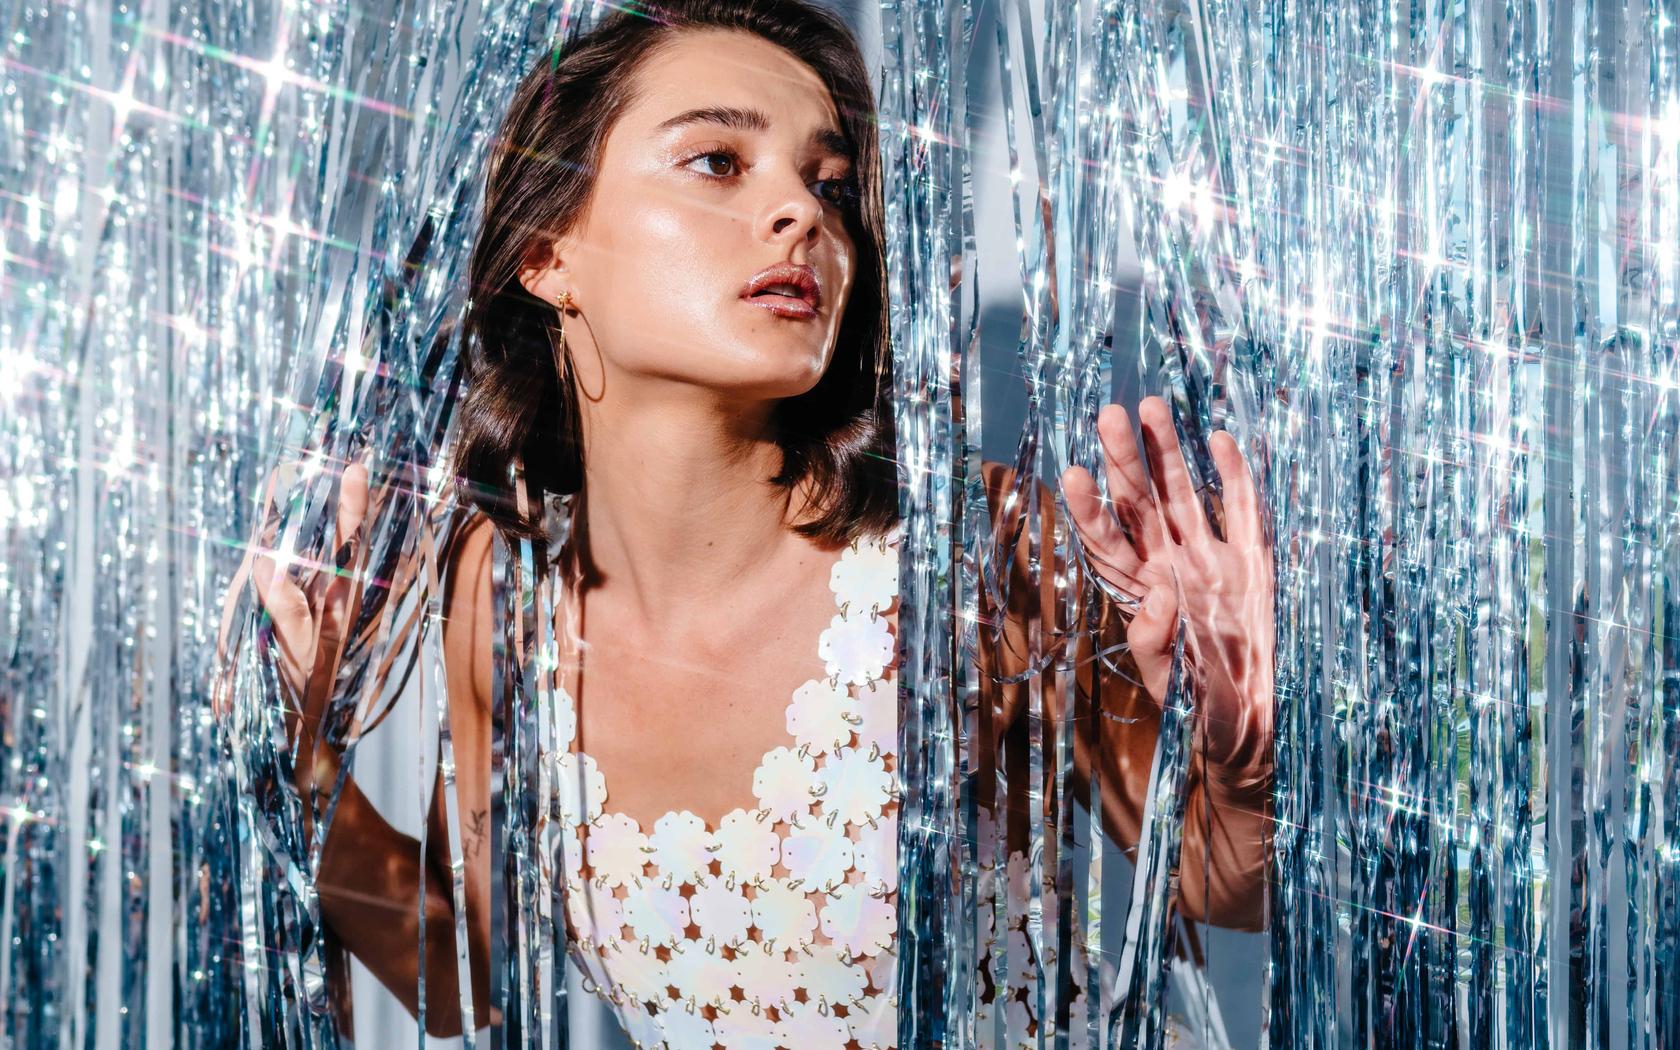 charlotte-lawrence-derrick-freske-for-euphoria-magazine-photoshoot-4k-y8.jpg